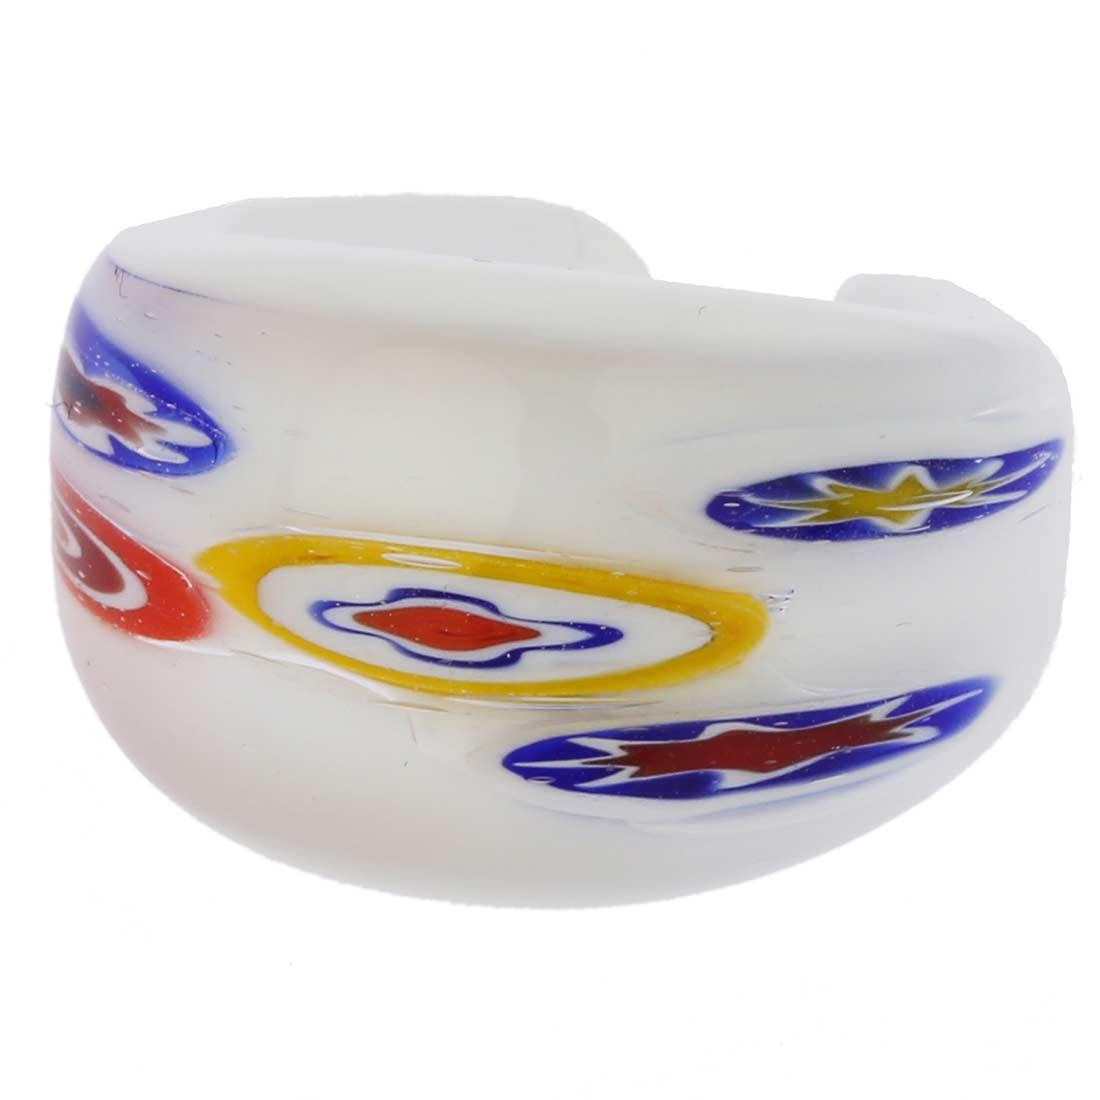 Murano Millefiori Ring In Domed Design - Milky White